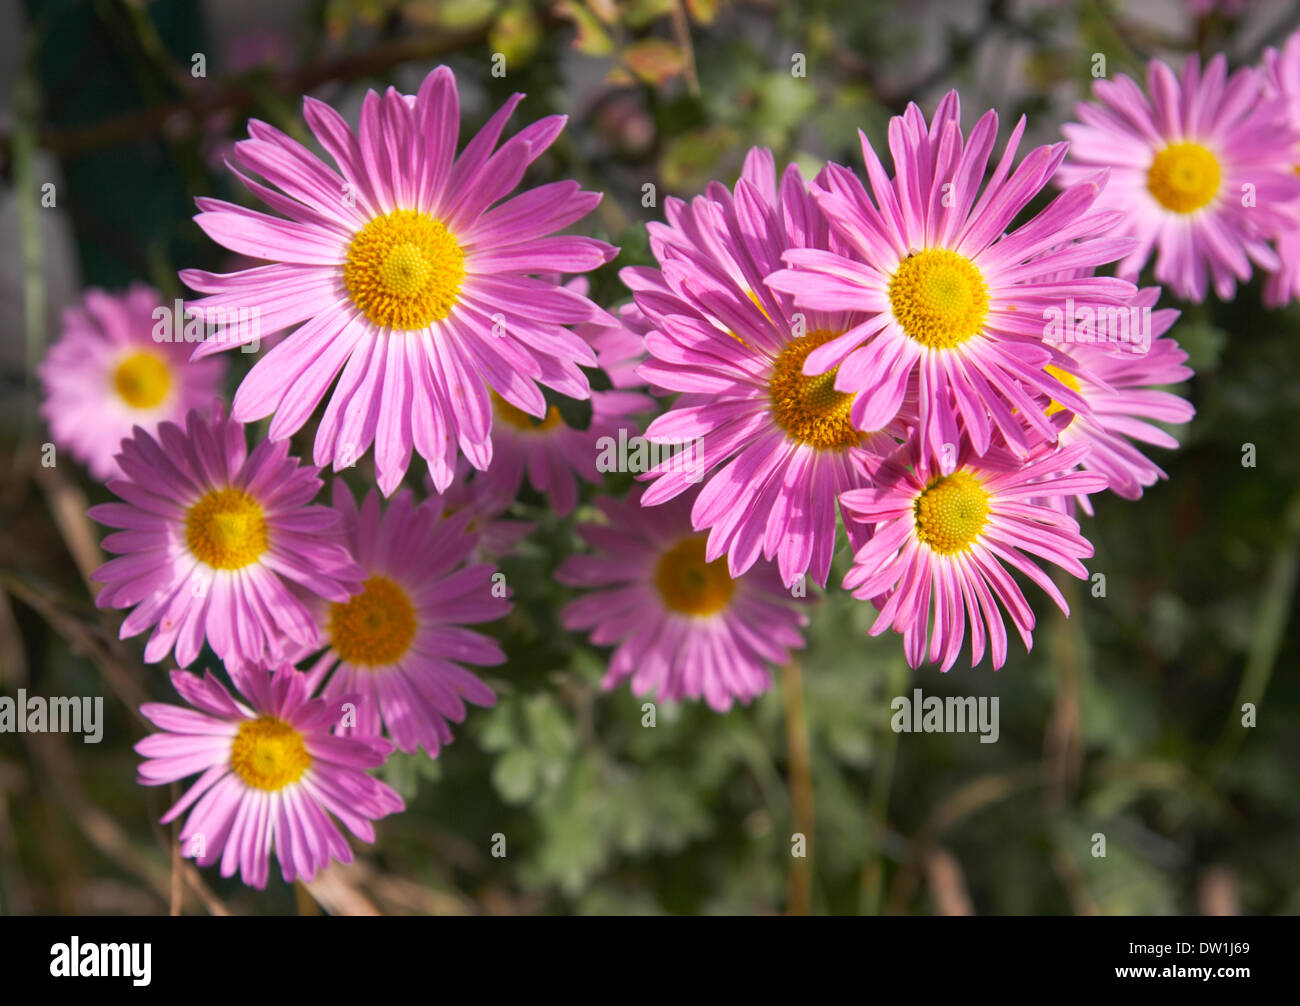 Fiori Autunnali.Fiori Autunnali Immagini Fiori Autunnali Fotos Stock Alamy